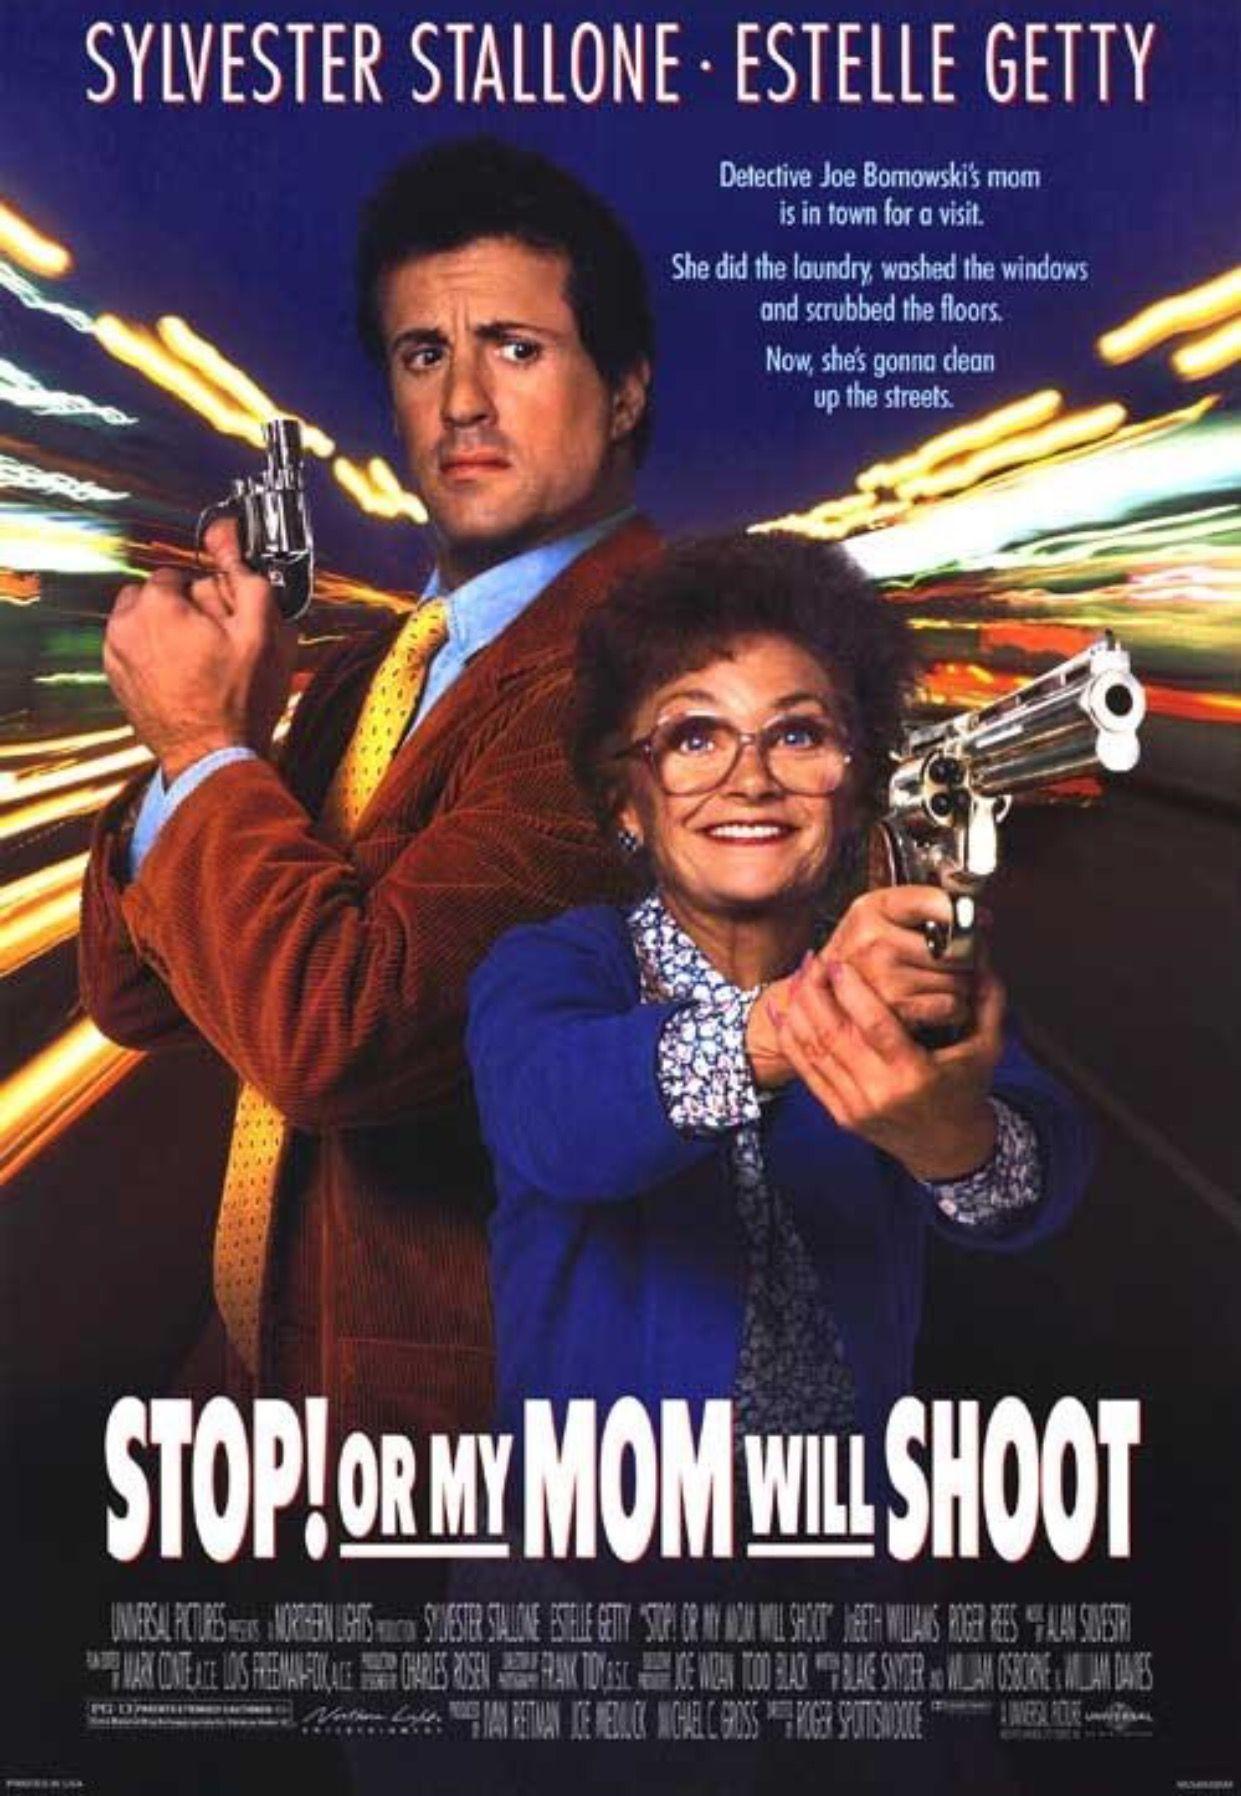 Stopormymomwillshoot 1992 Sylvester Stallone Movies Bad Film